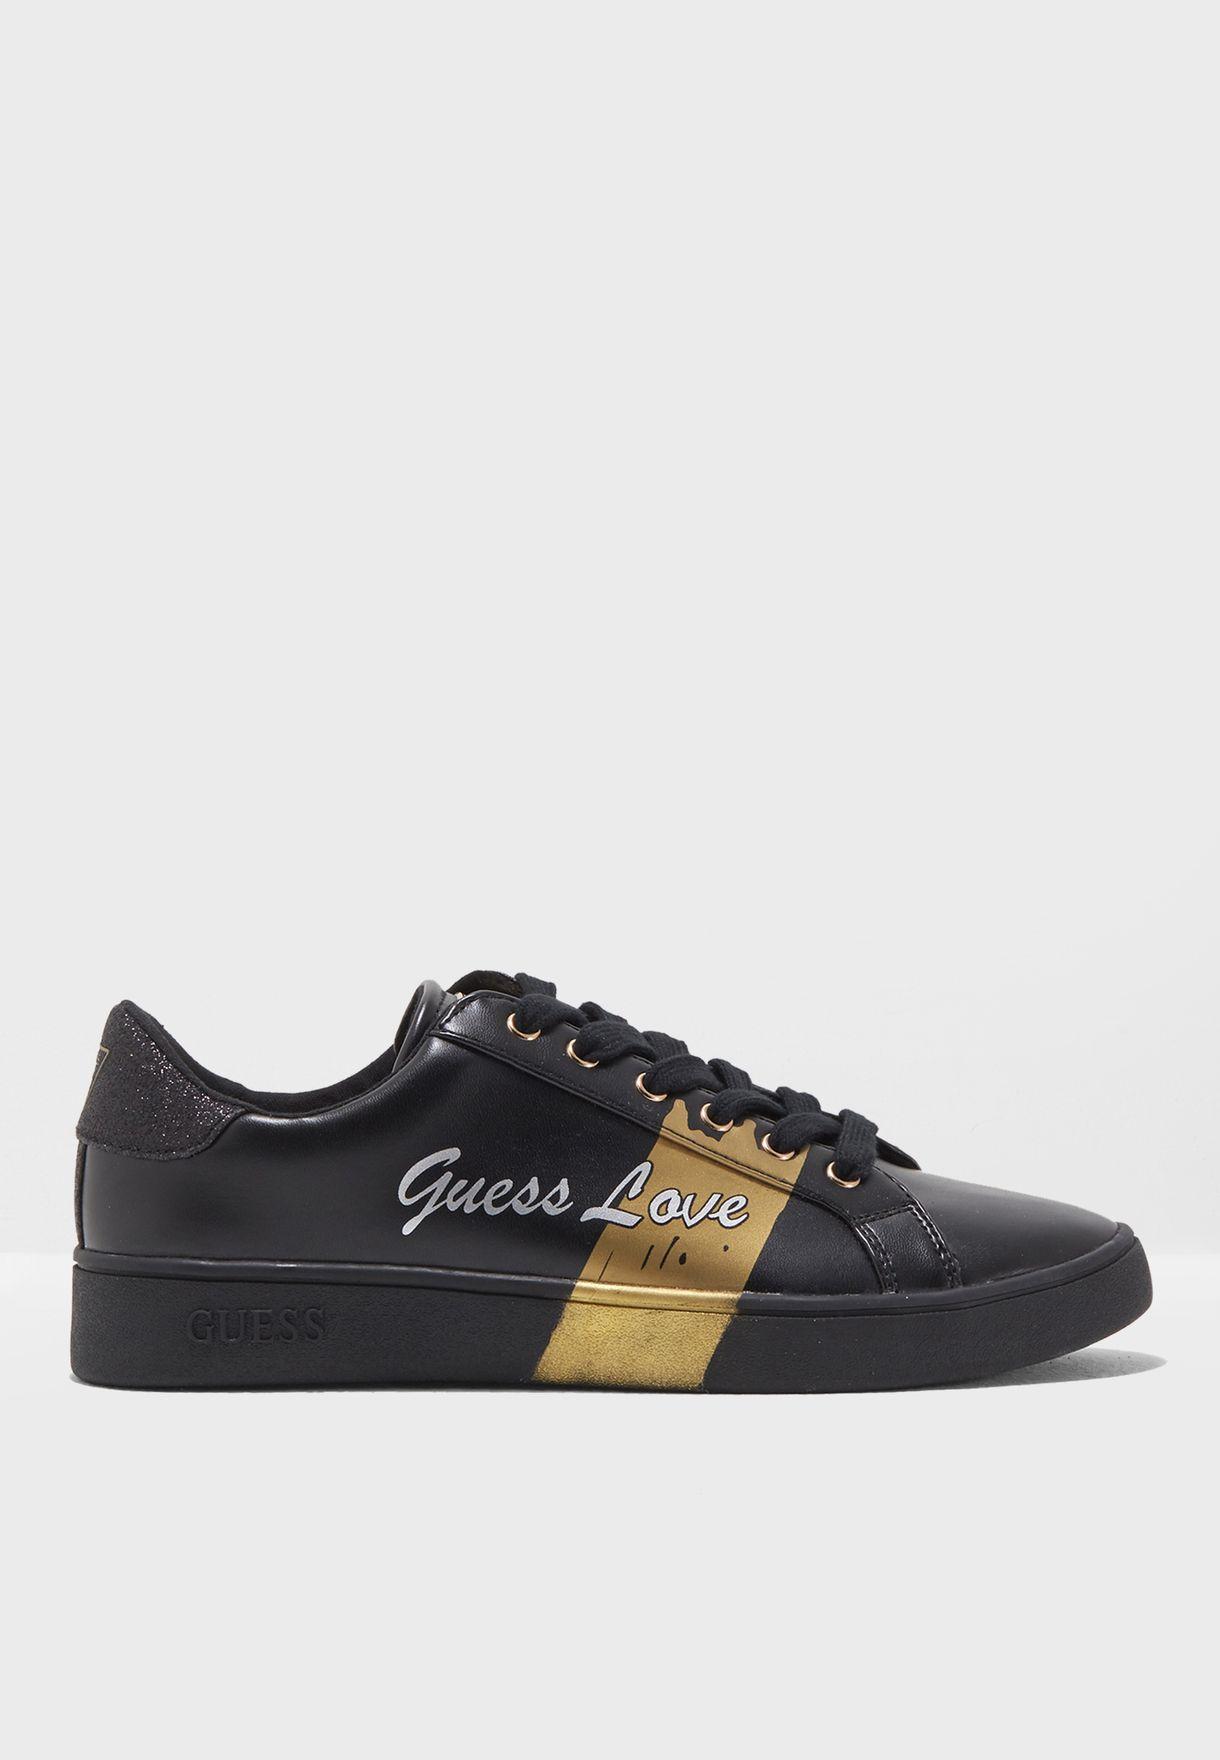 Bobo Guess Love Low Top Sneaker